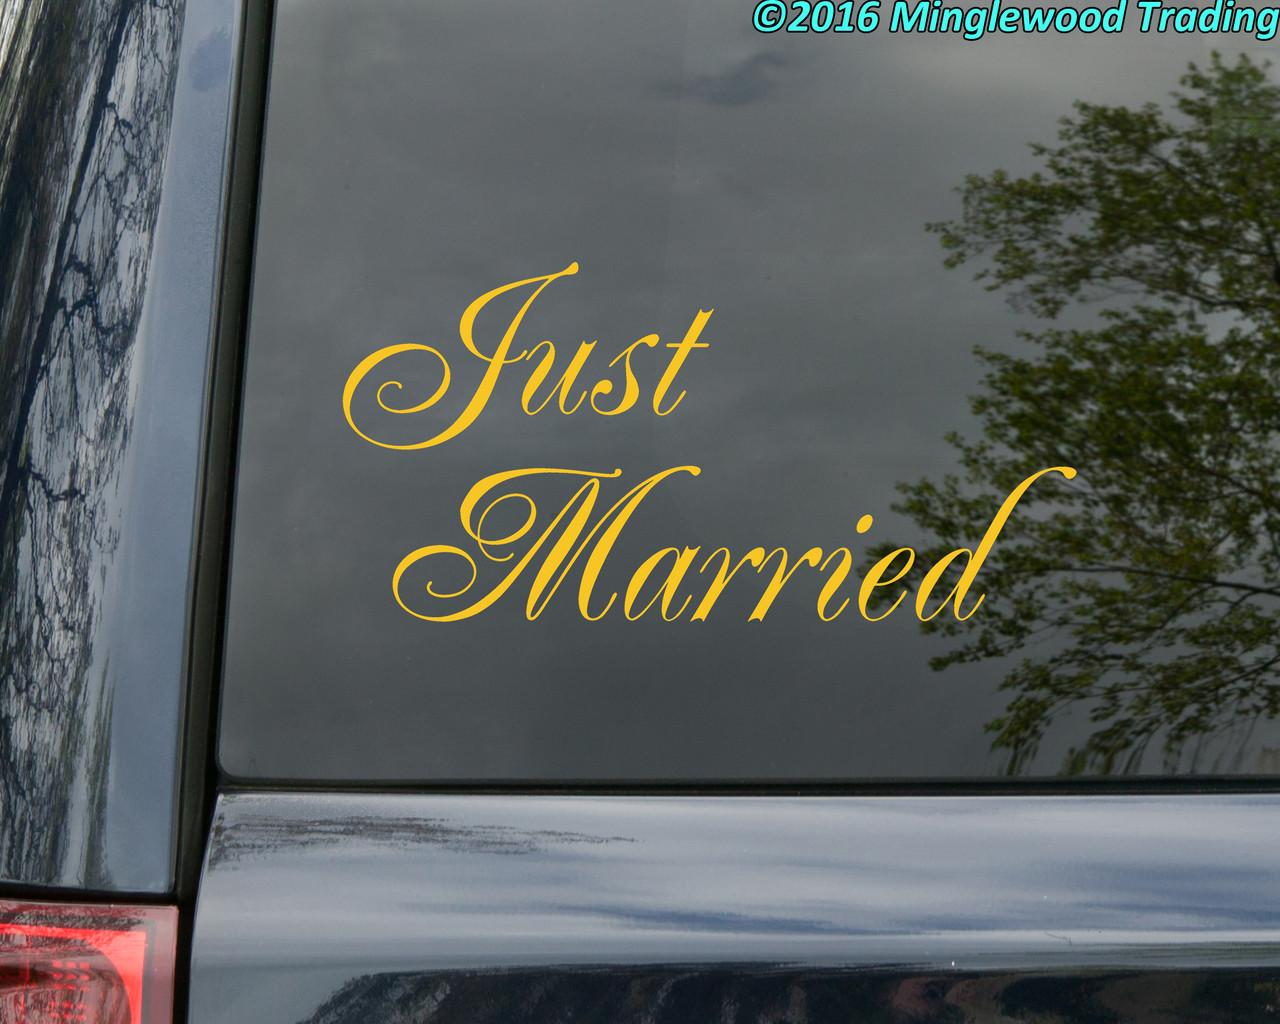 "Just Married 11.5"" x 6"" Vinyl Sticker - Honeymoon Wedding Marriage Vows Love - Die Cut Decal"